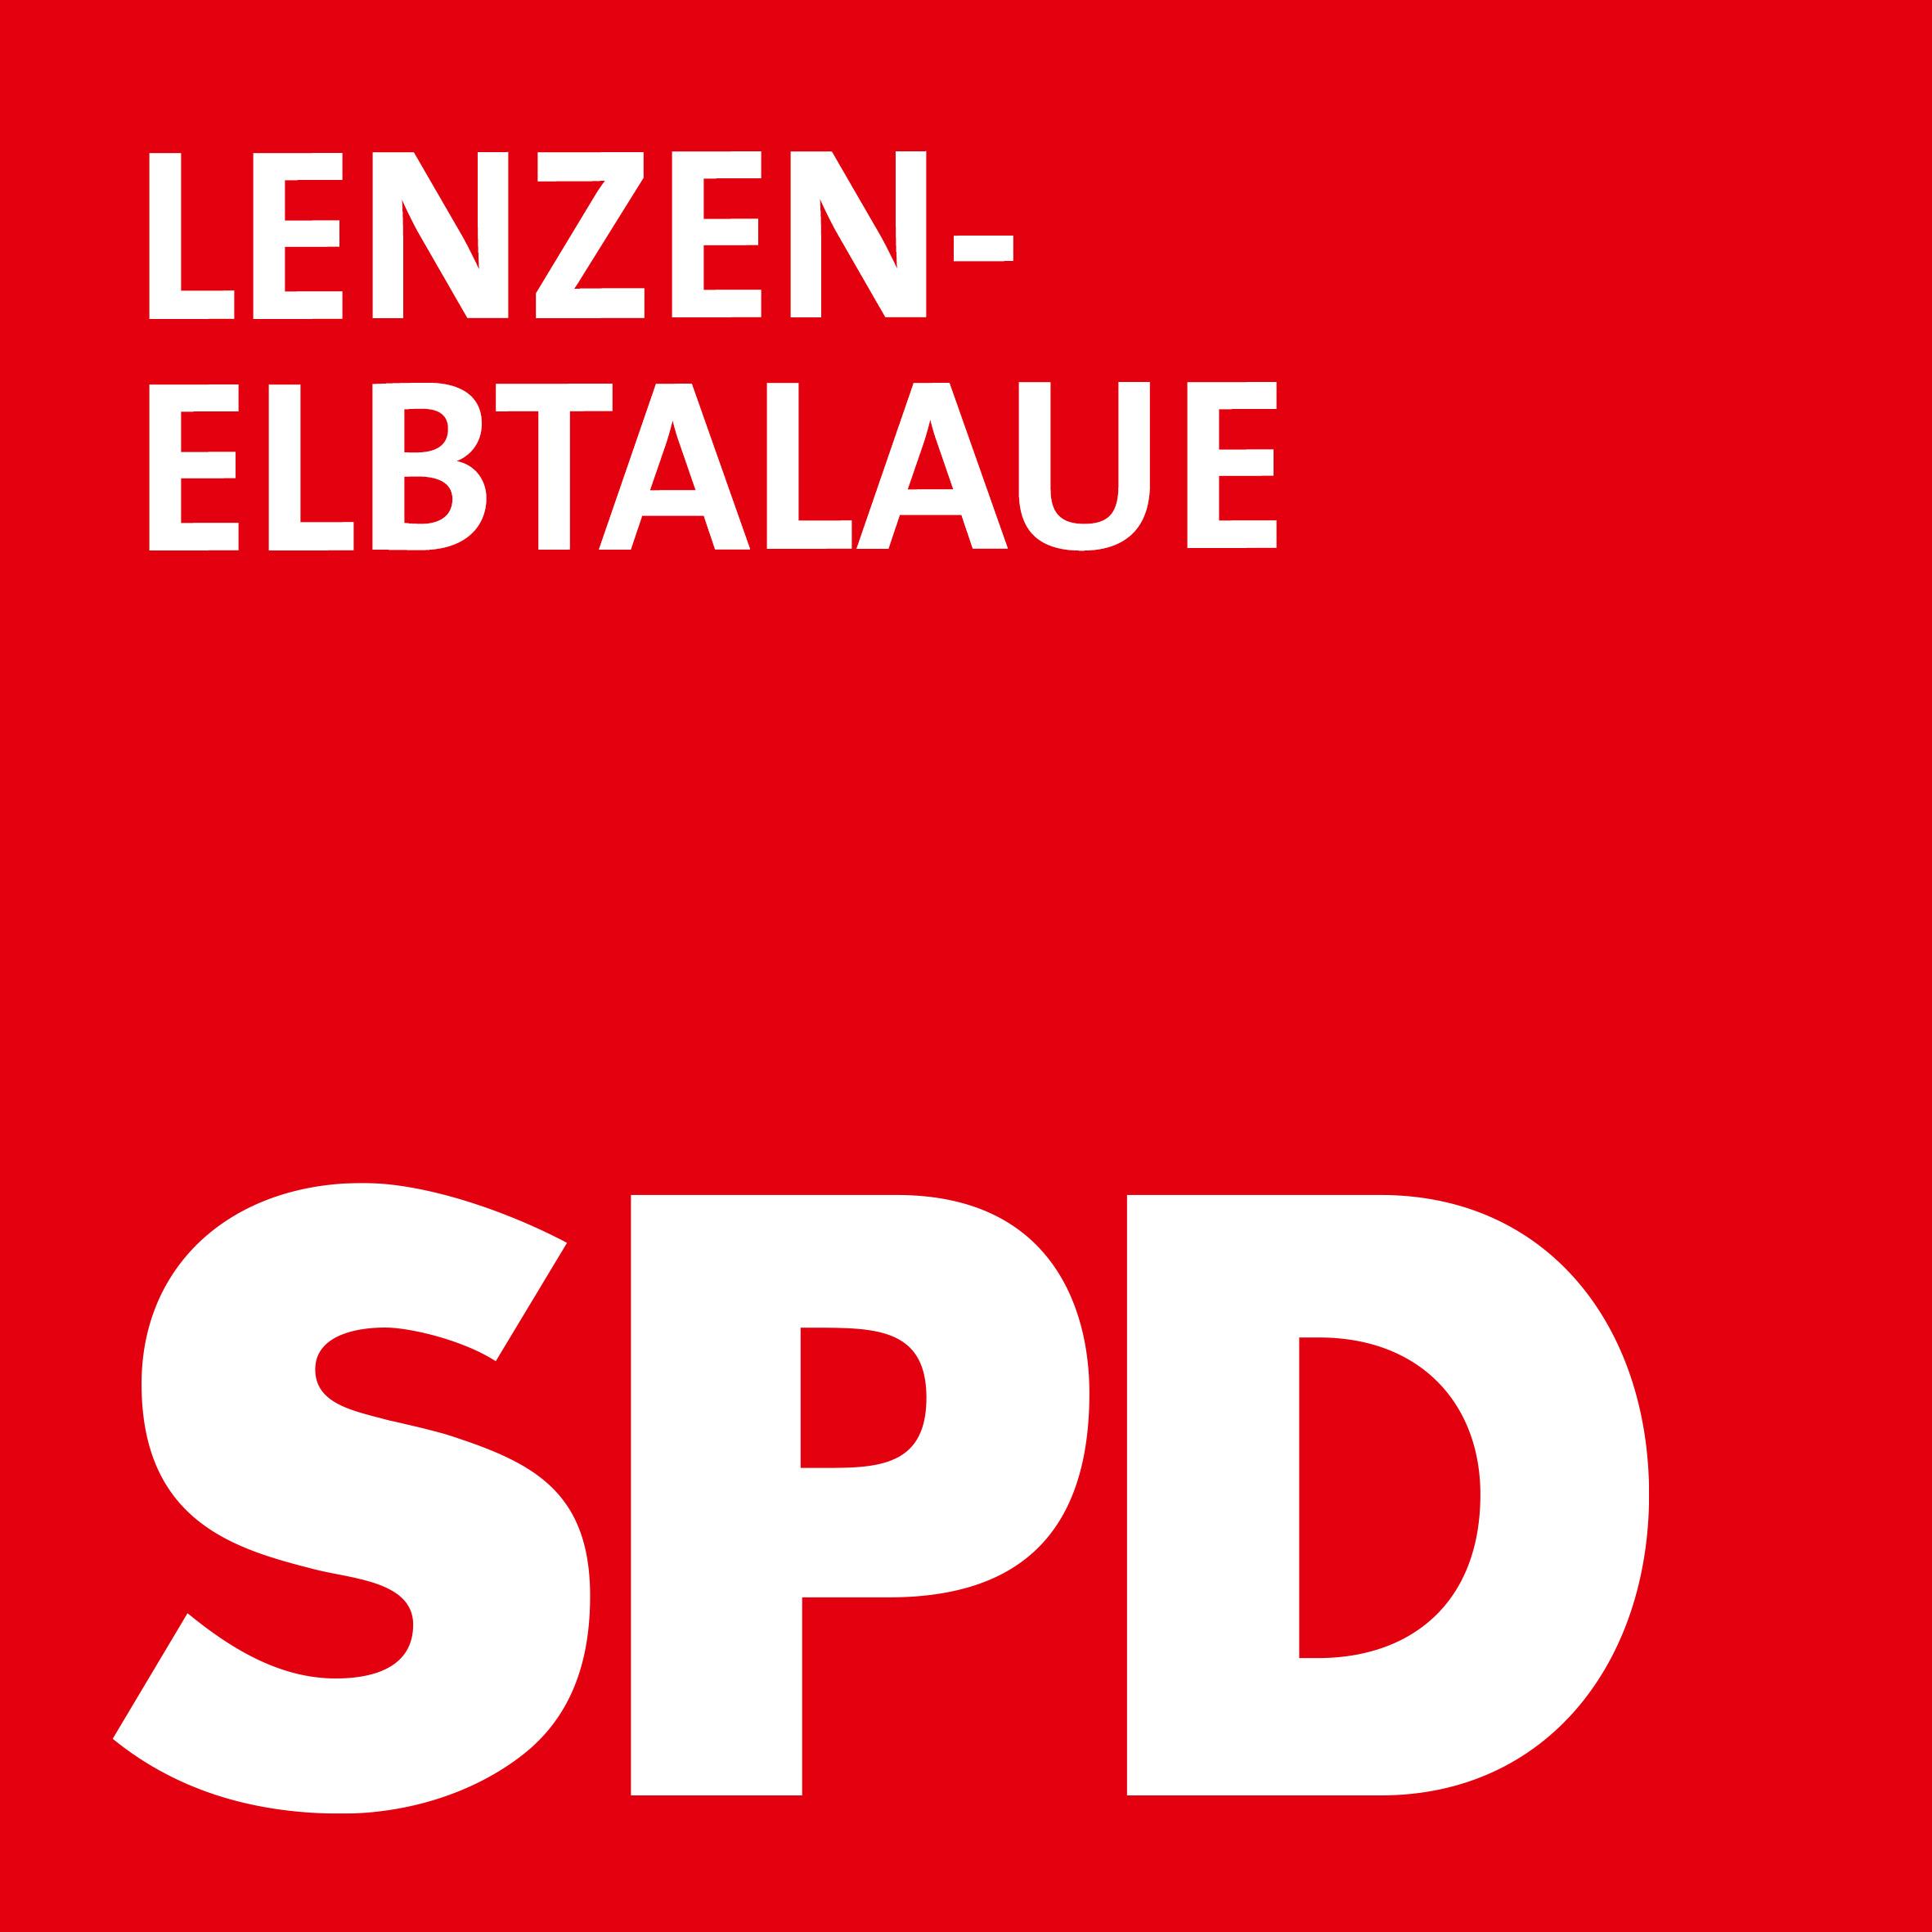 SPD Lenzen-Elbtalaue